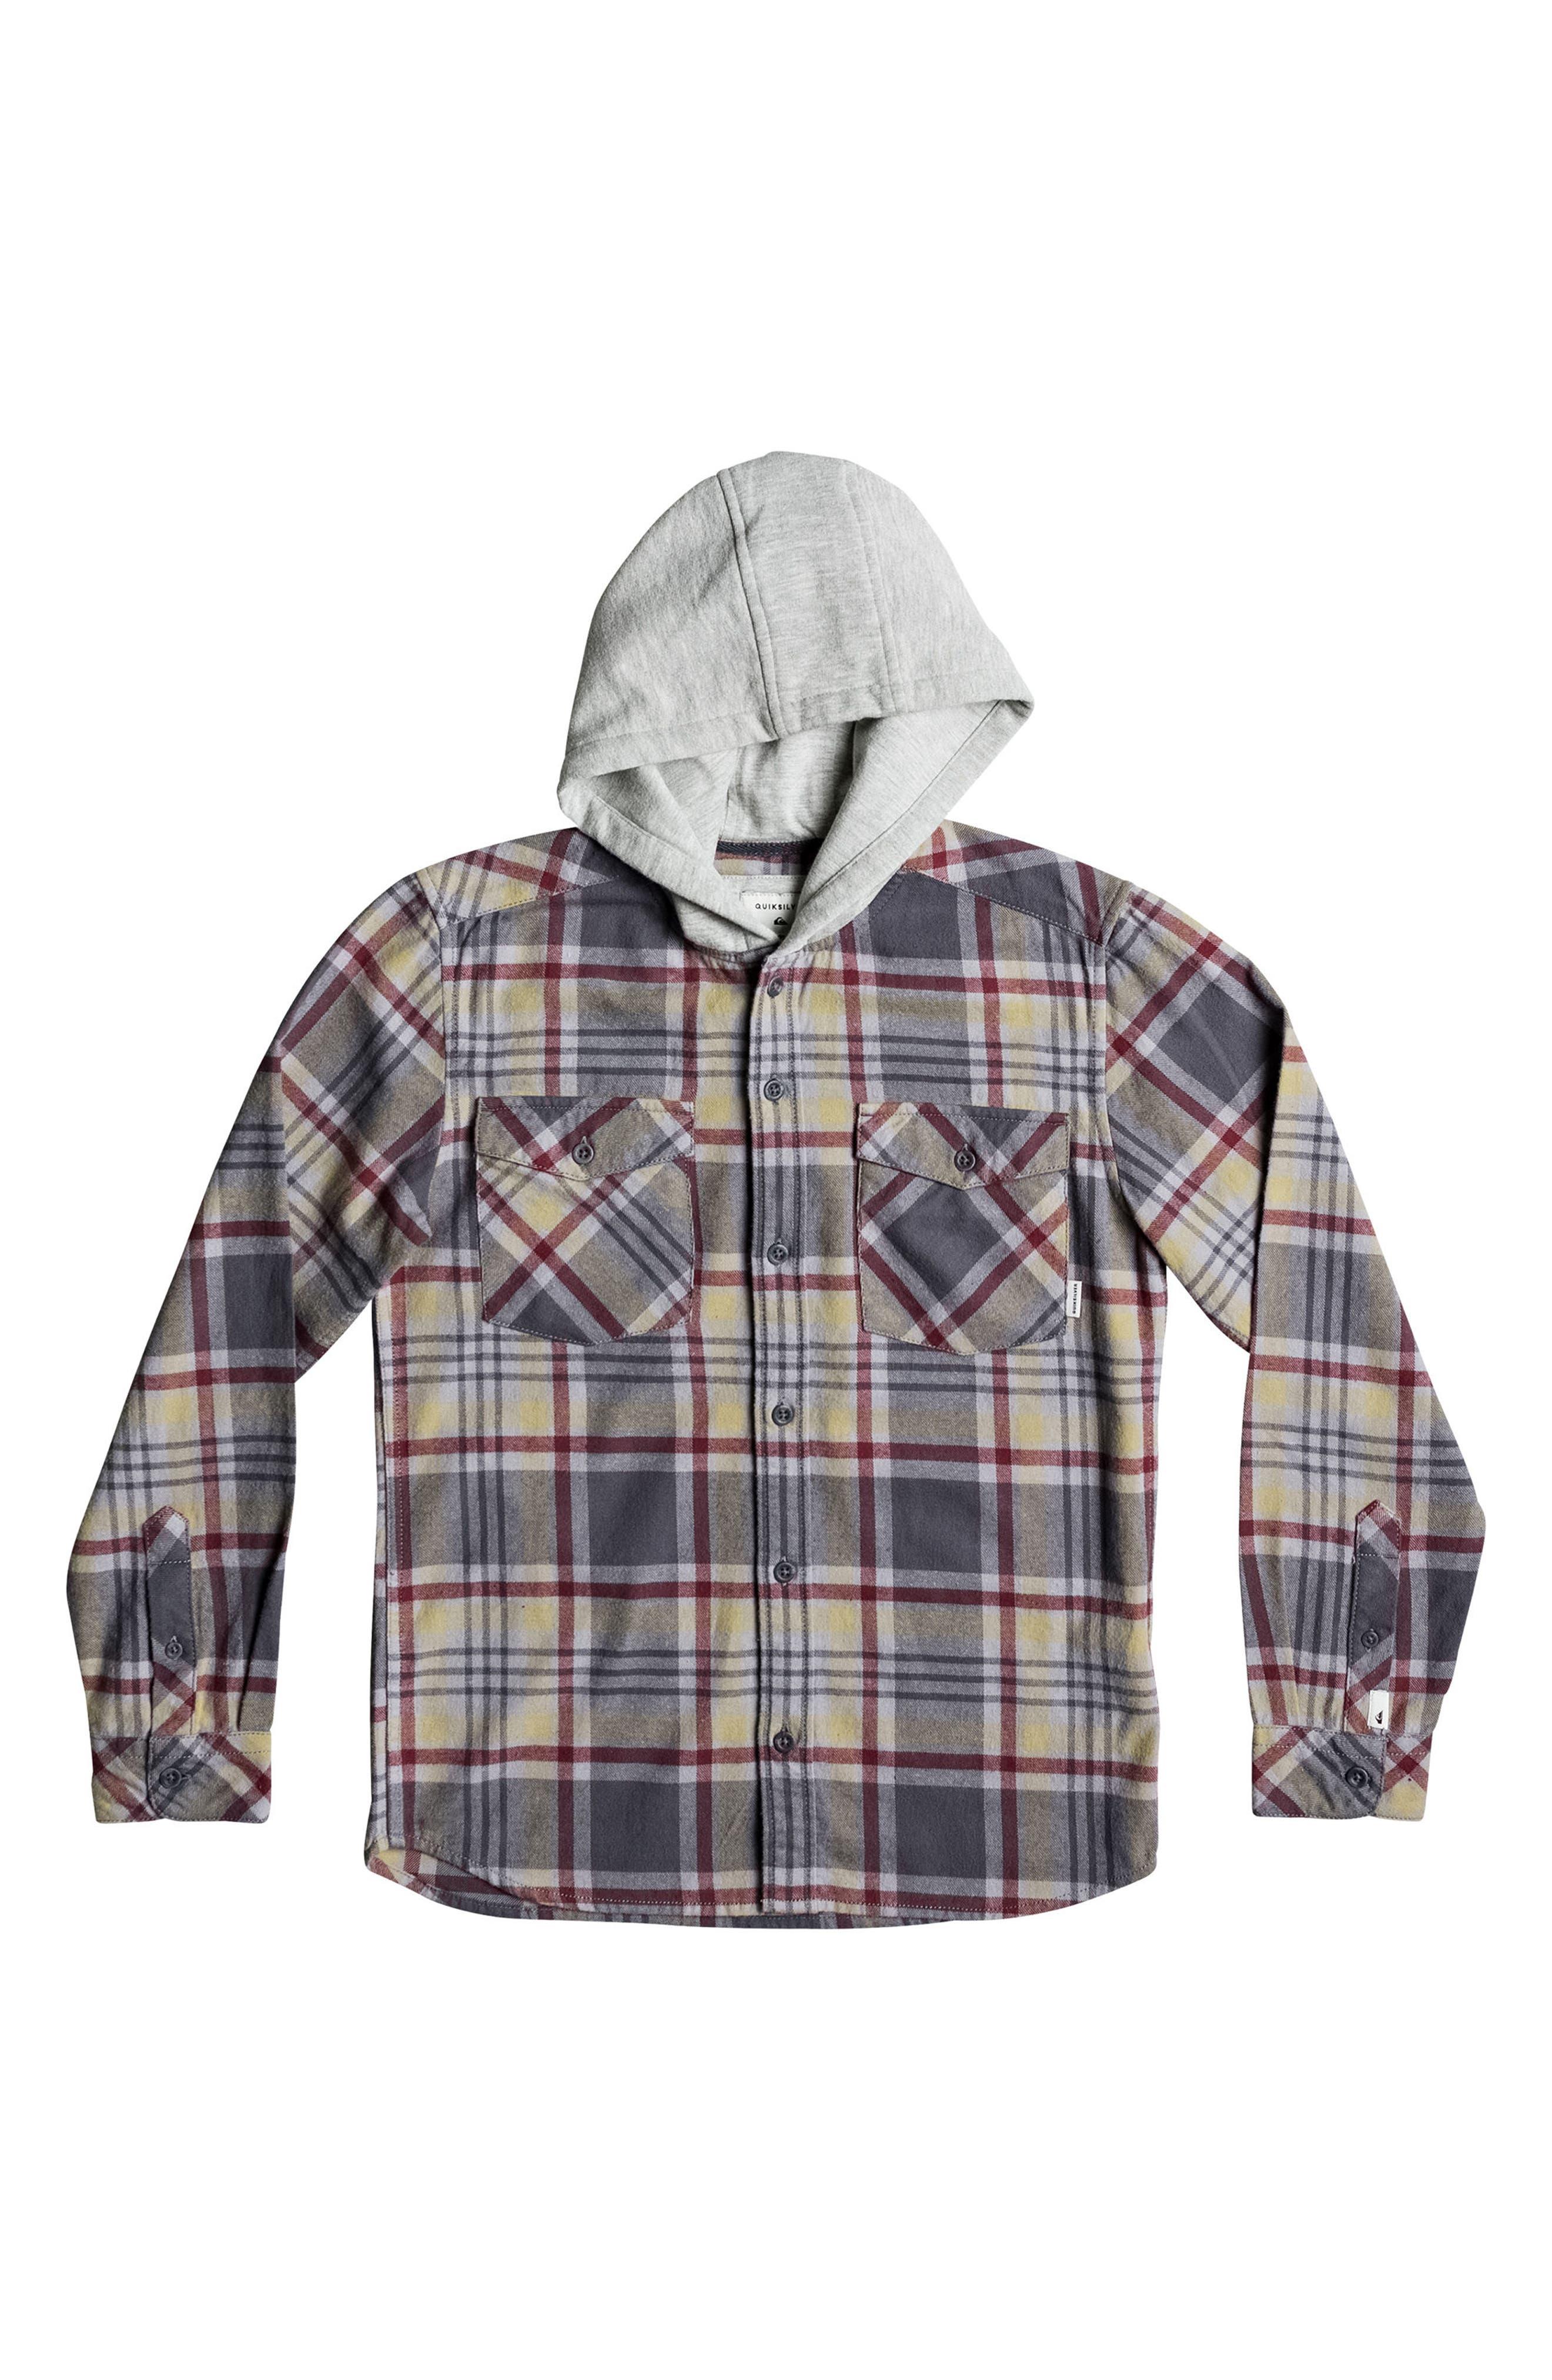 Quiksilver Hooded Tang Plaid Flannel Shirt (Big Boys)